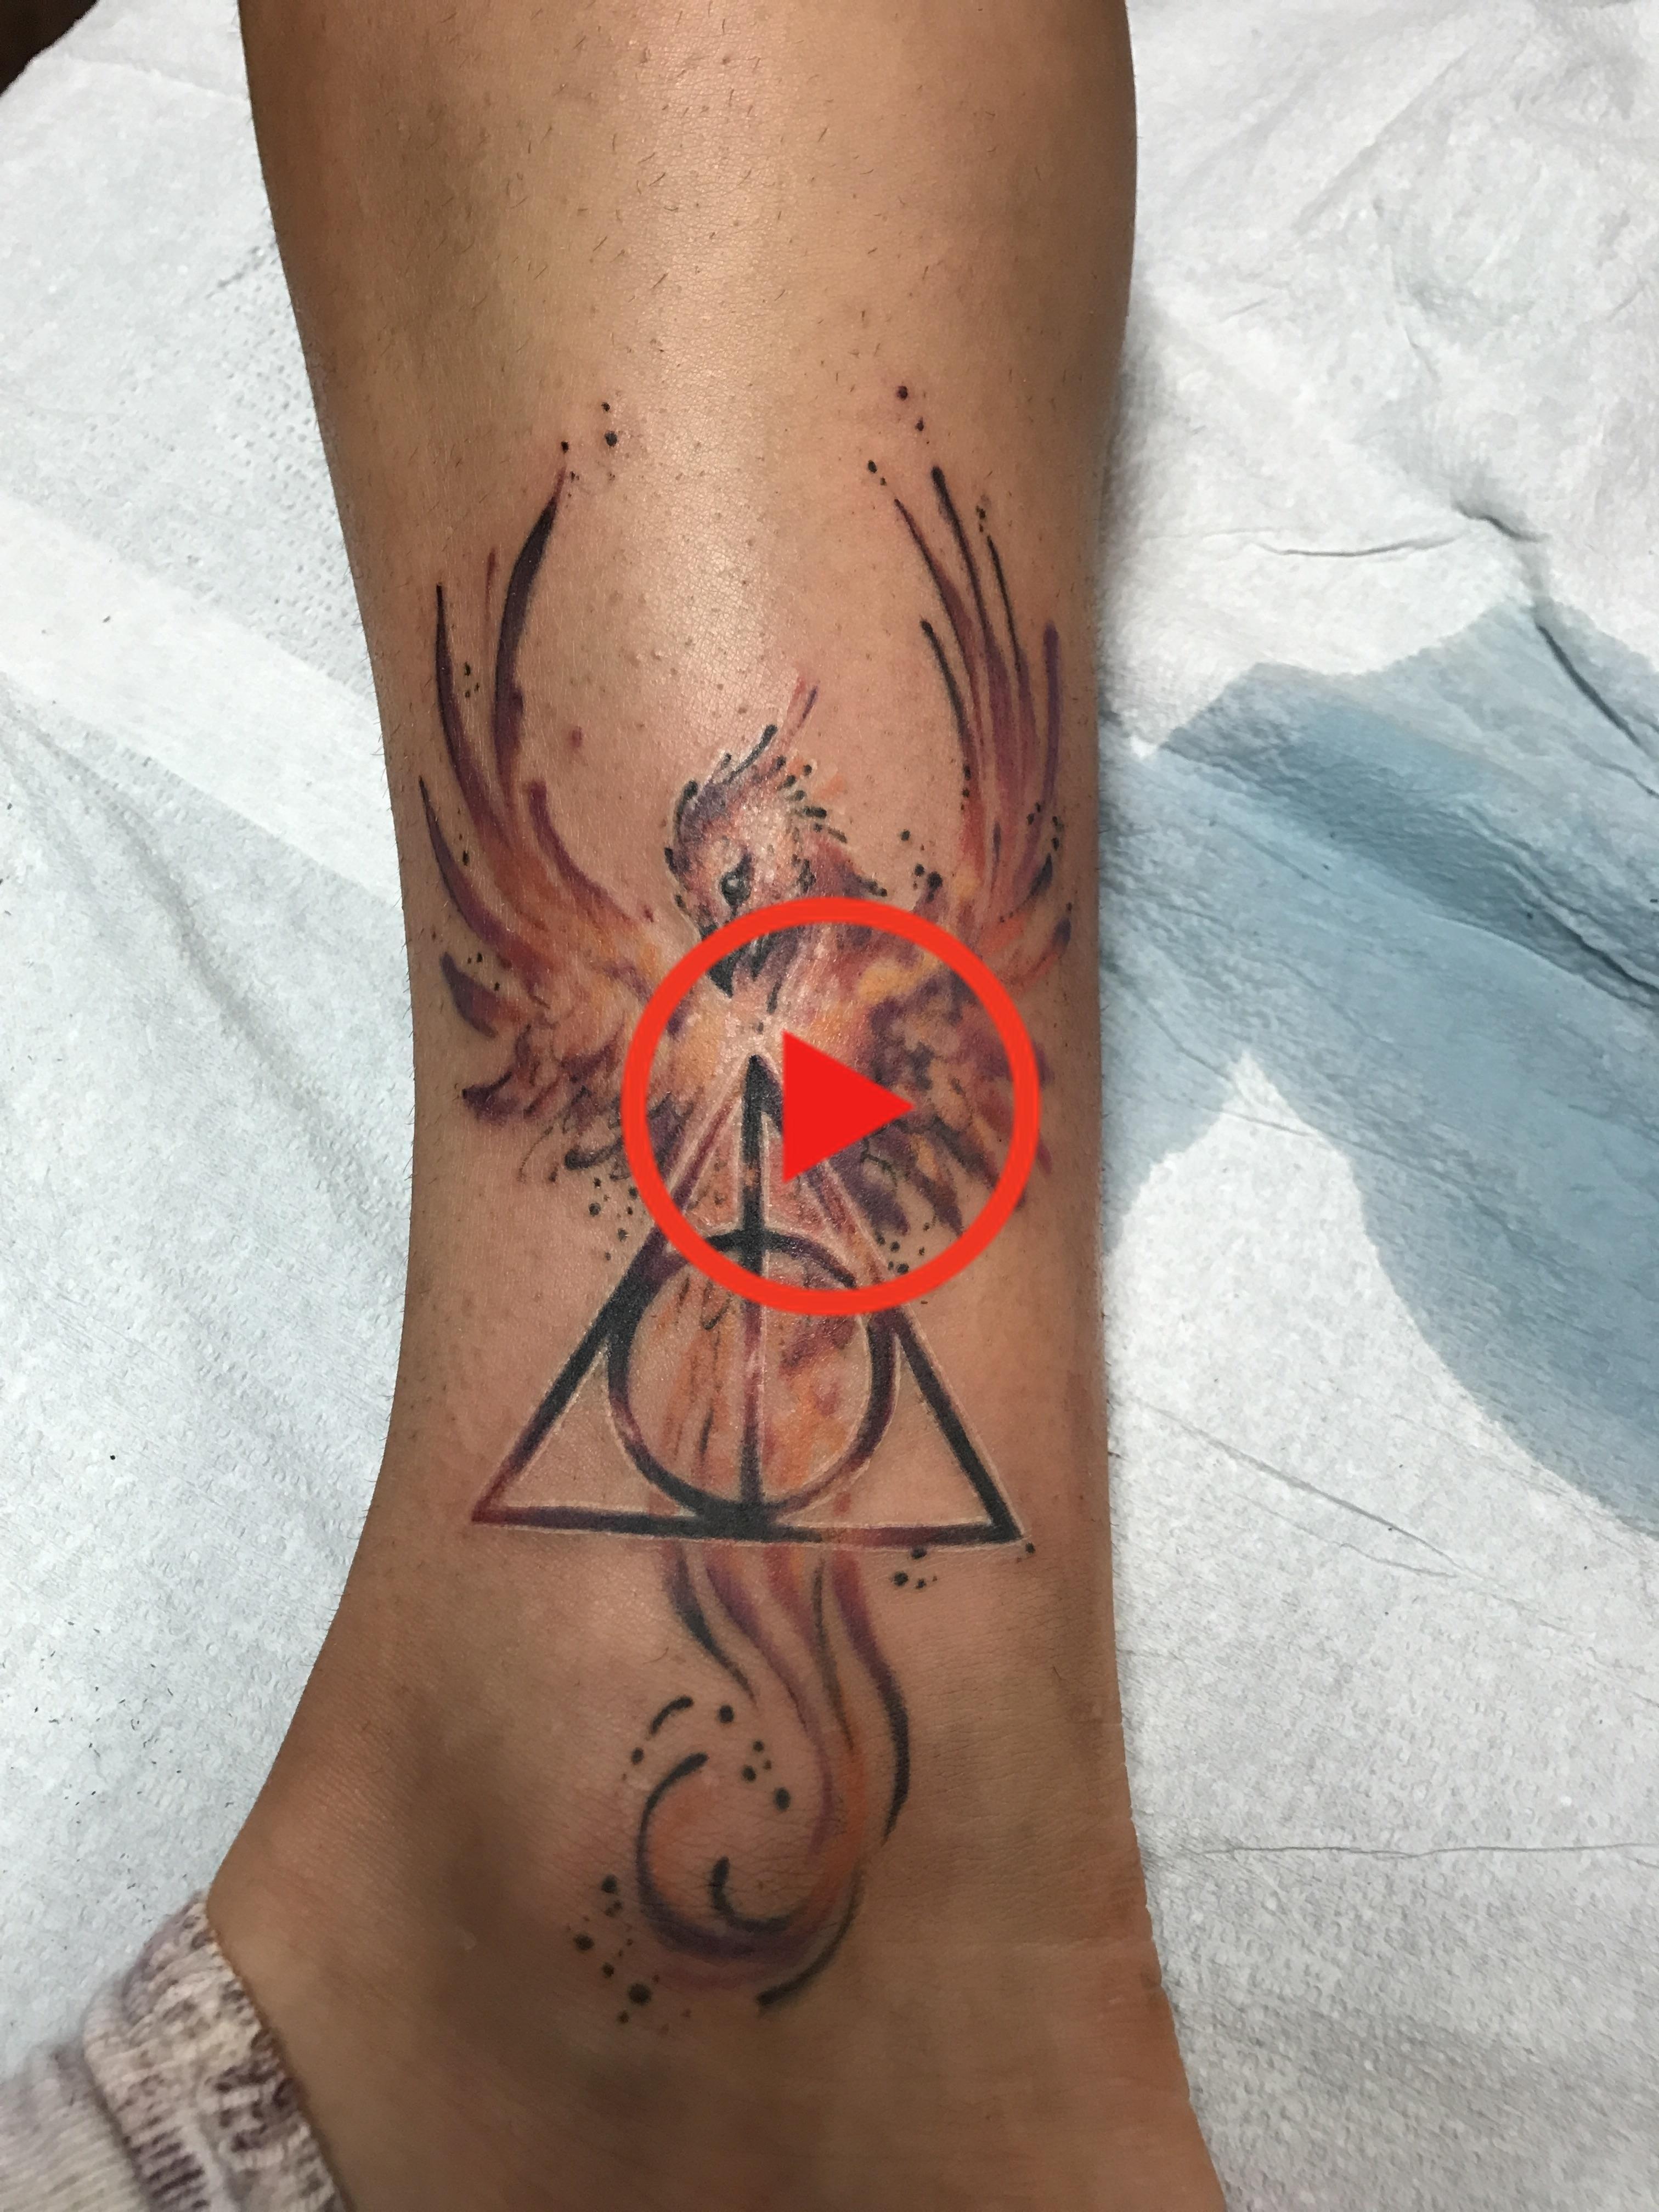 Dieses Harry Potter Tattoo Meine Freundin Bekam Heute Tattoo Von Invidia Tattoo In Asheville Harry Potter Tattoo Tattoos Dreamcatcher Tattoo